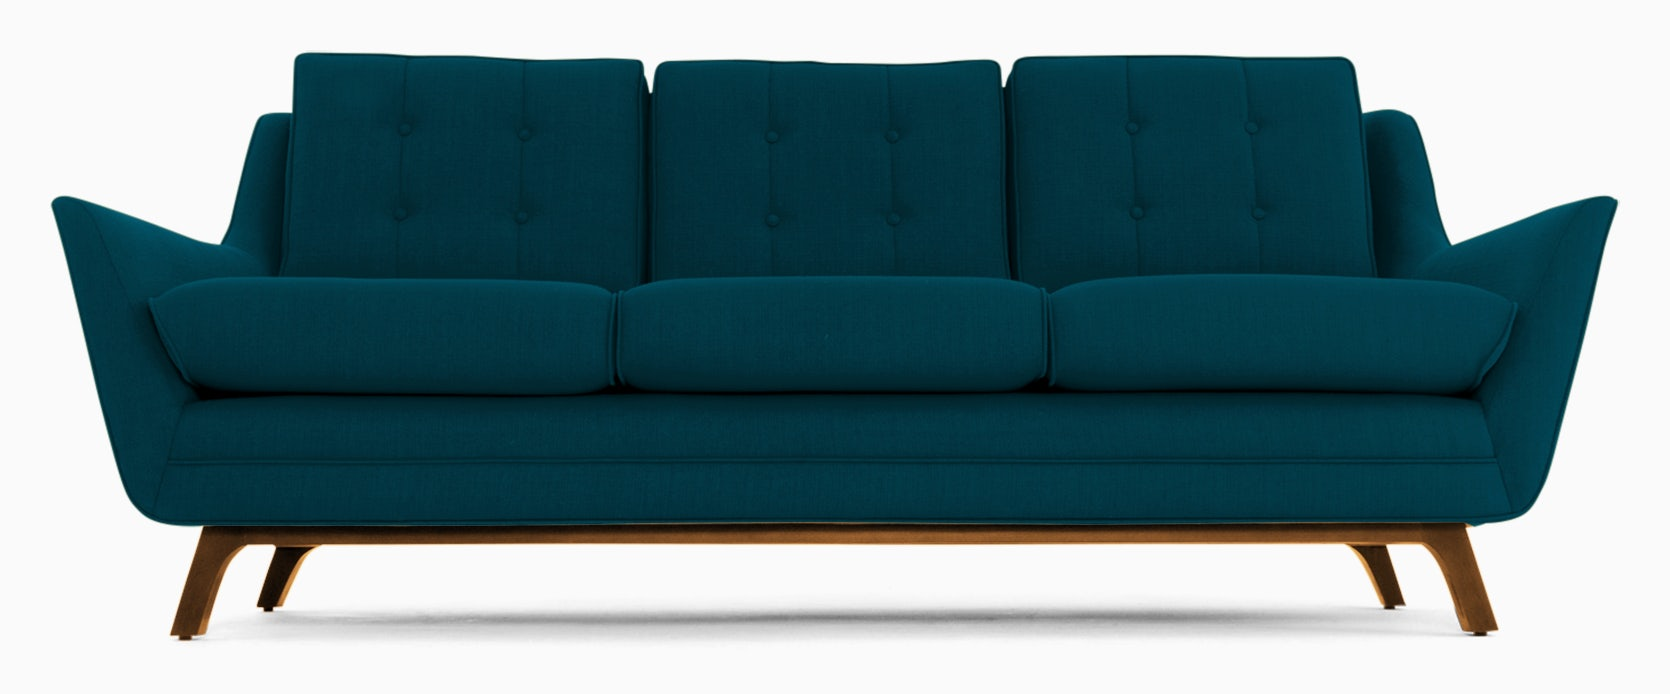 eastwood sofa key largo zenith teal